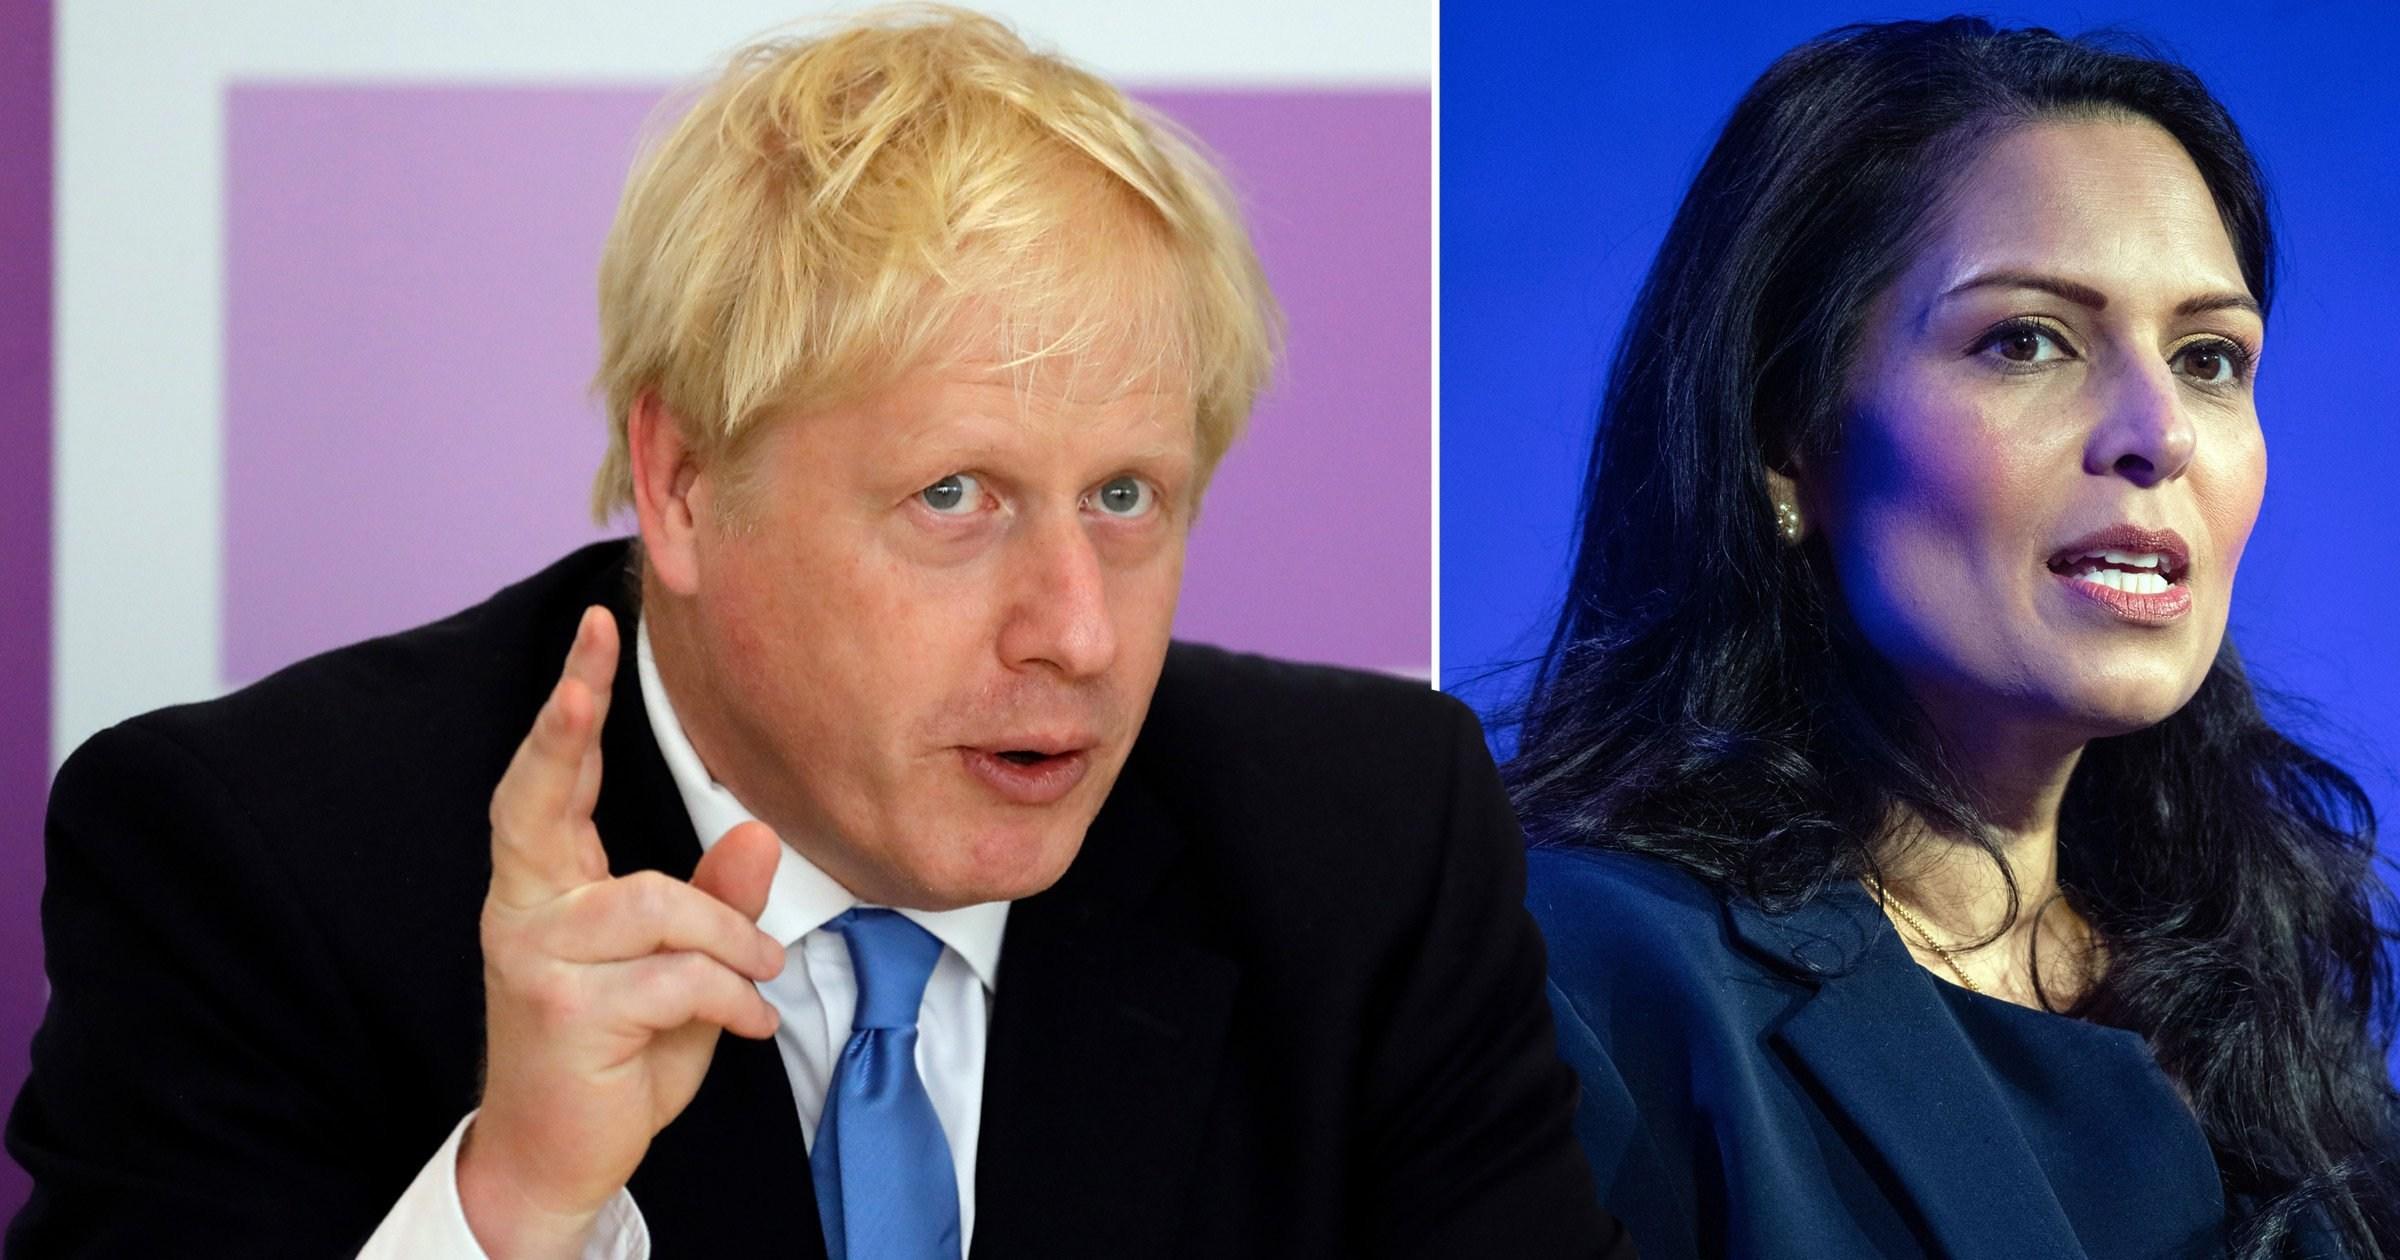 Boris Johnson tried to get Priti Patel bullying report 'watered down'